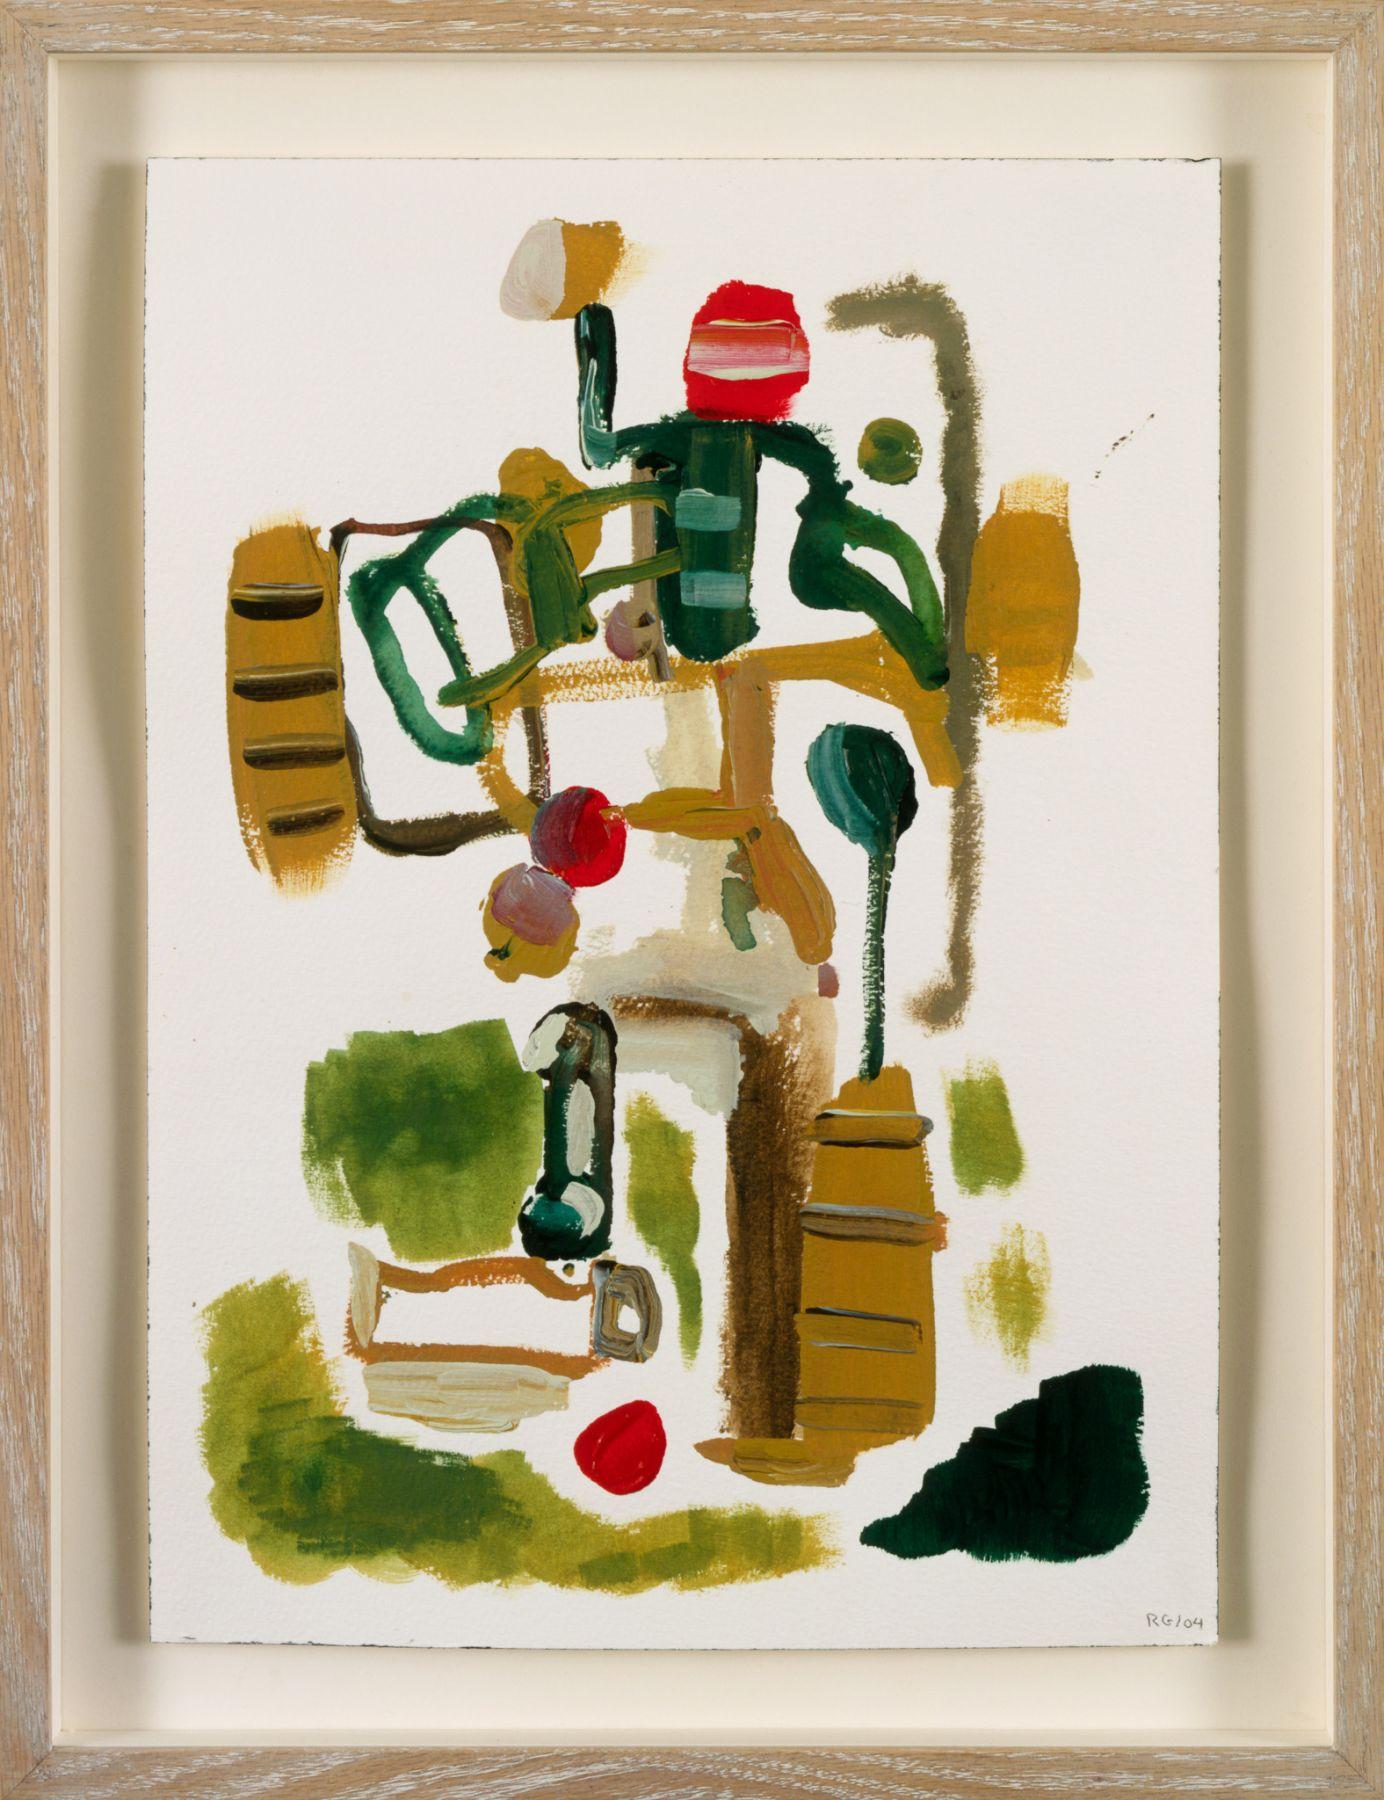 Rodney Graham, Untitled, 2004